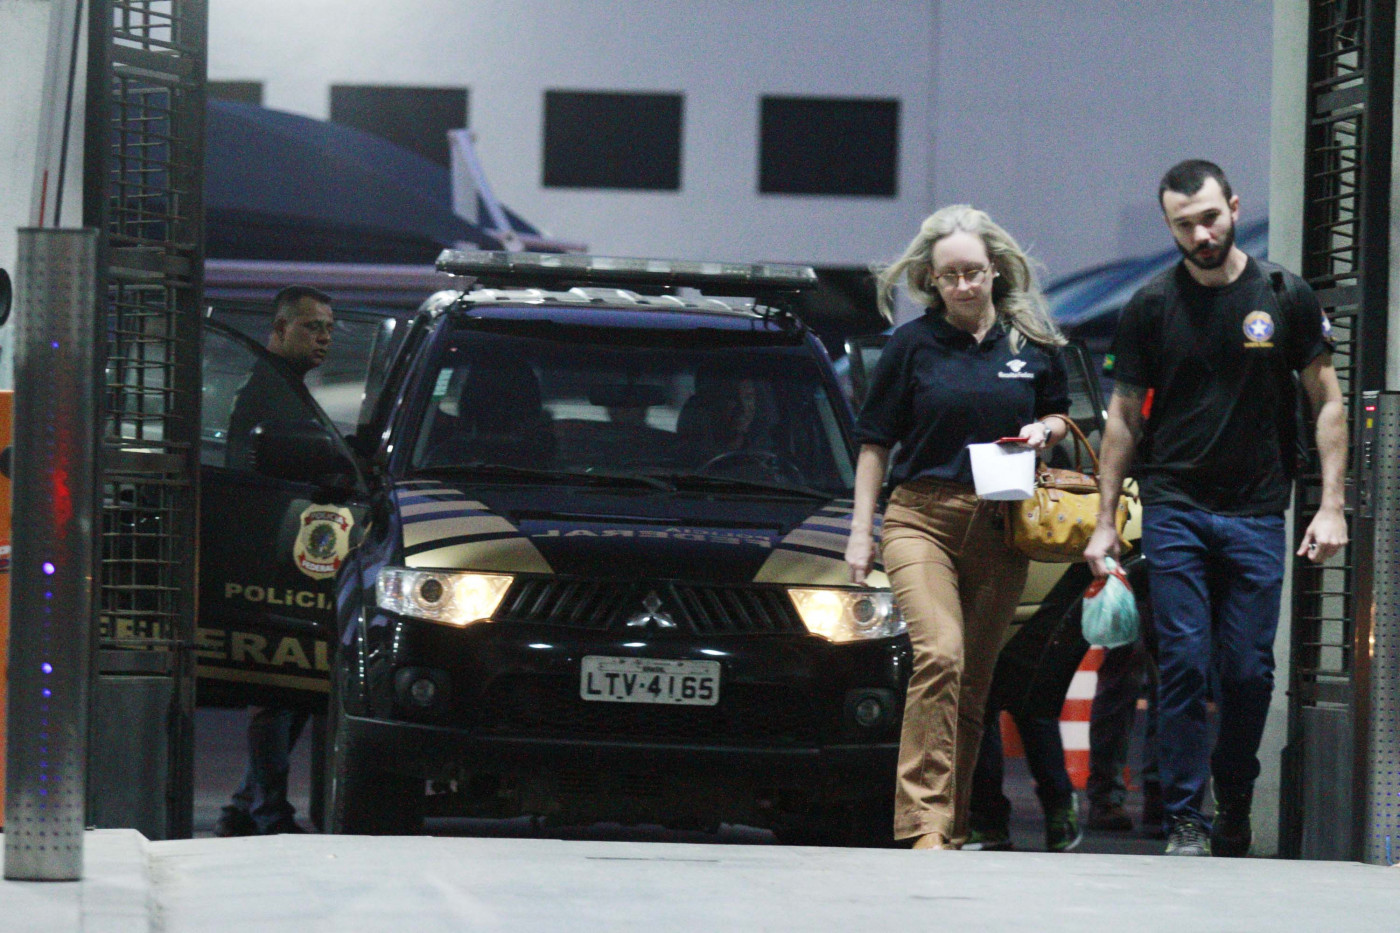 operacao-armadeira-policia-federal